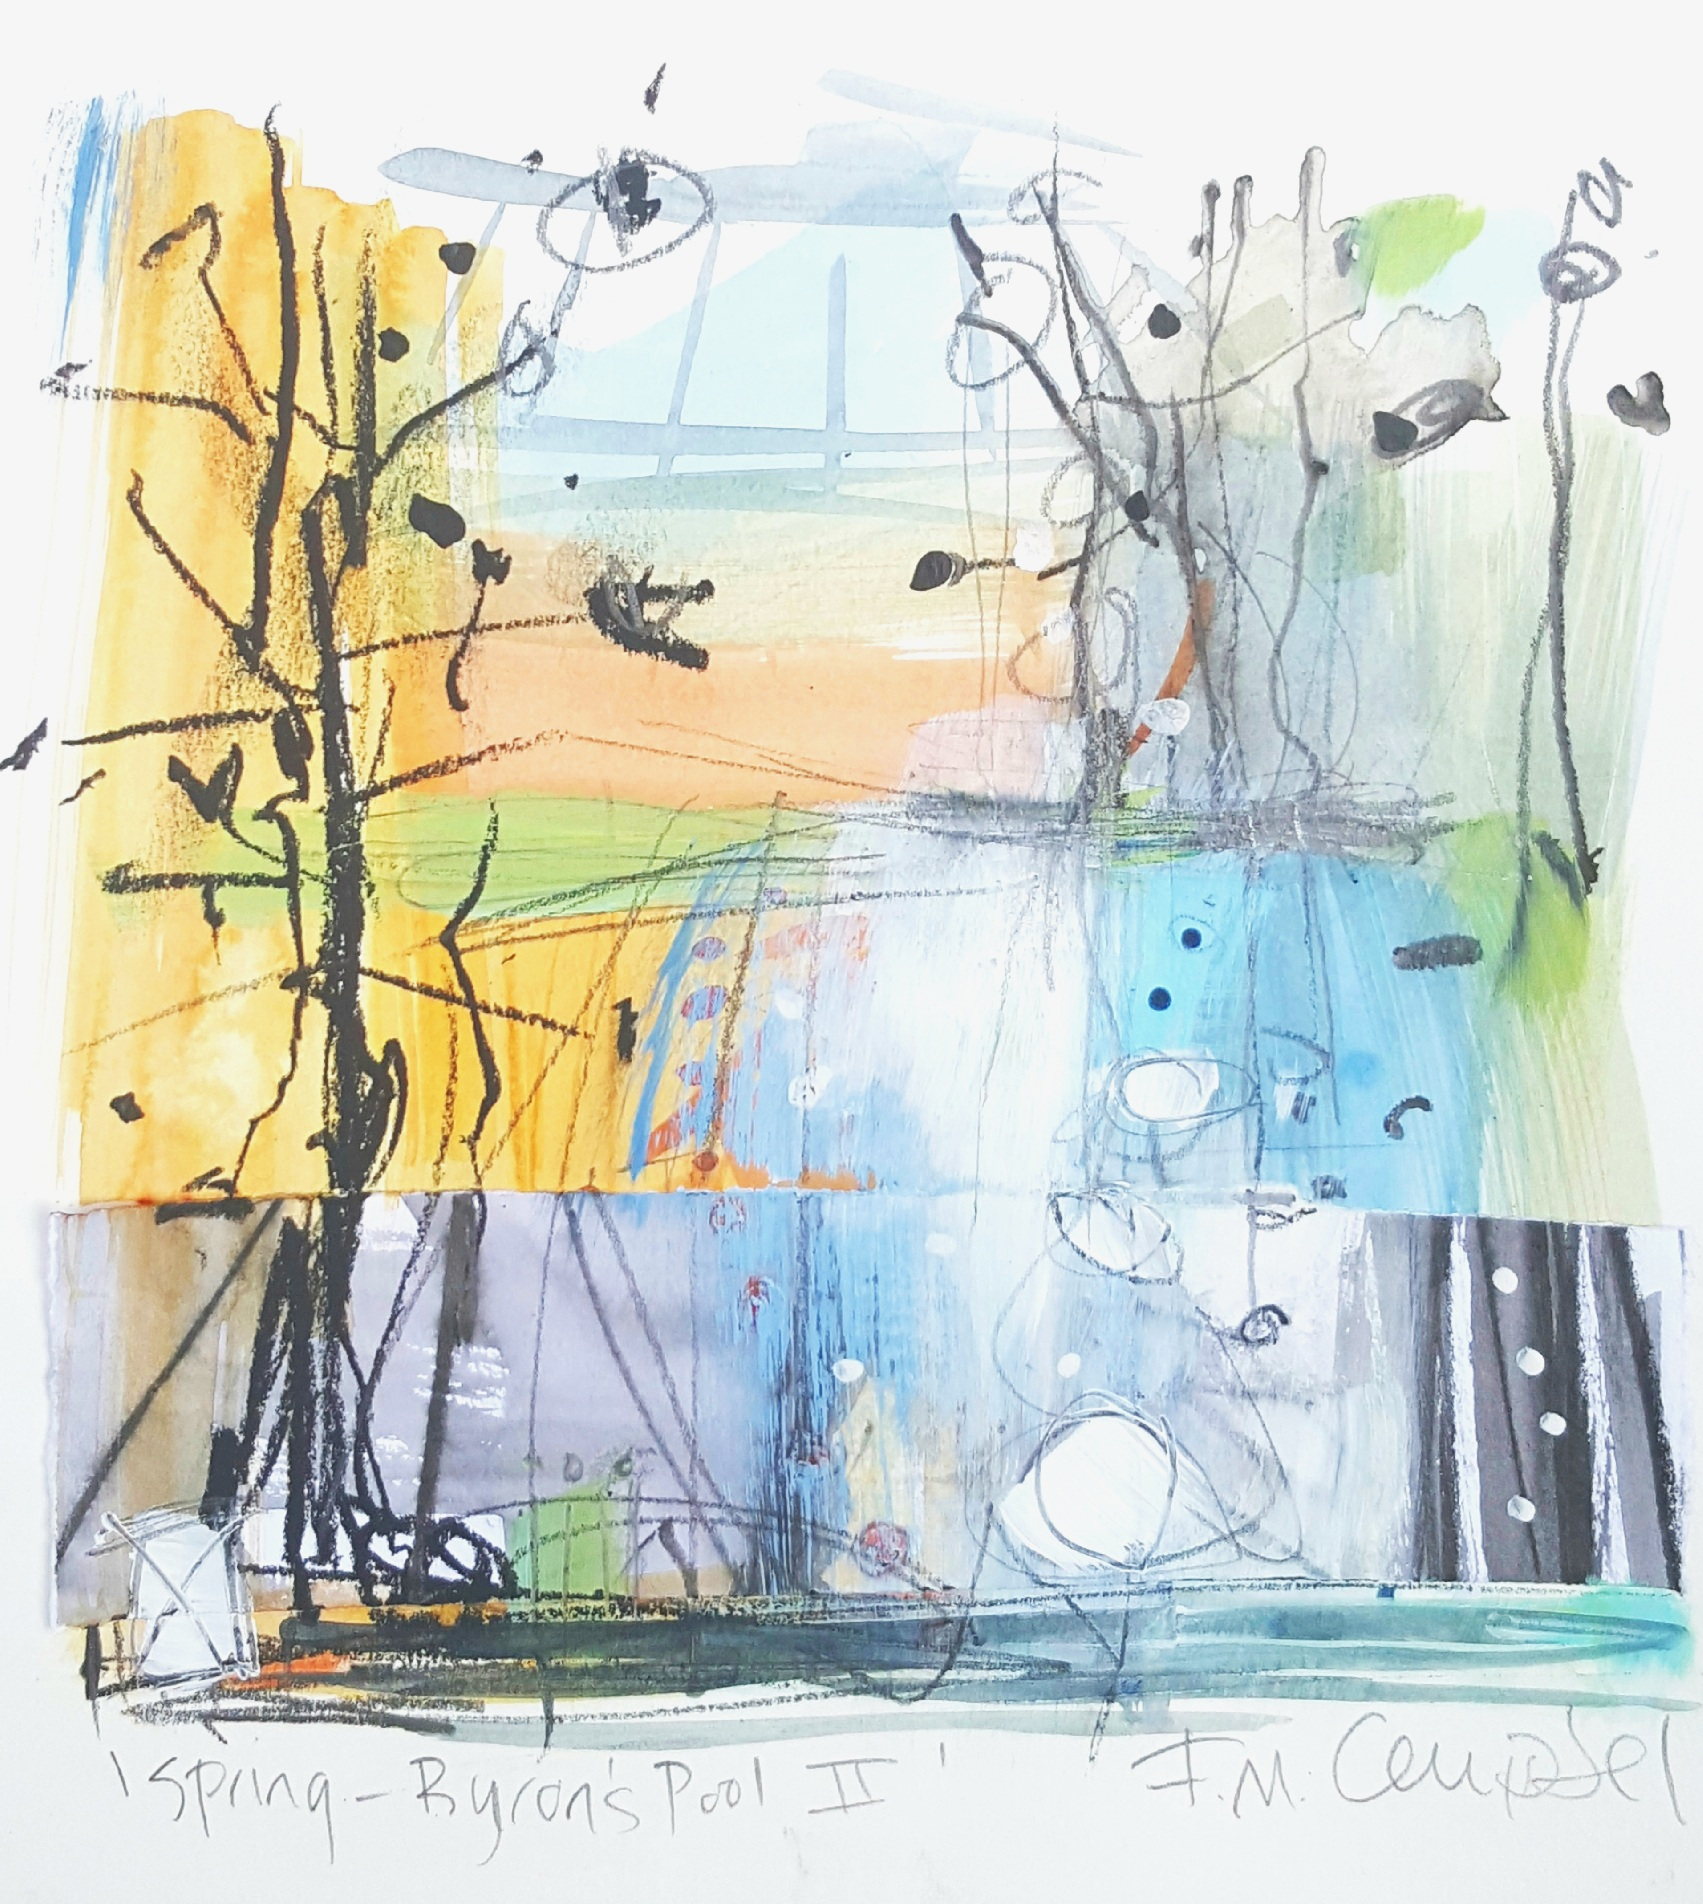 'Spring - Byron's Pool III'